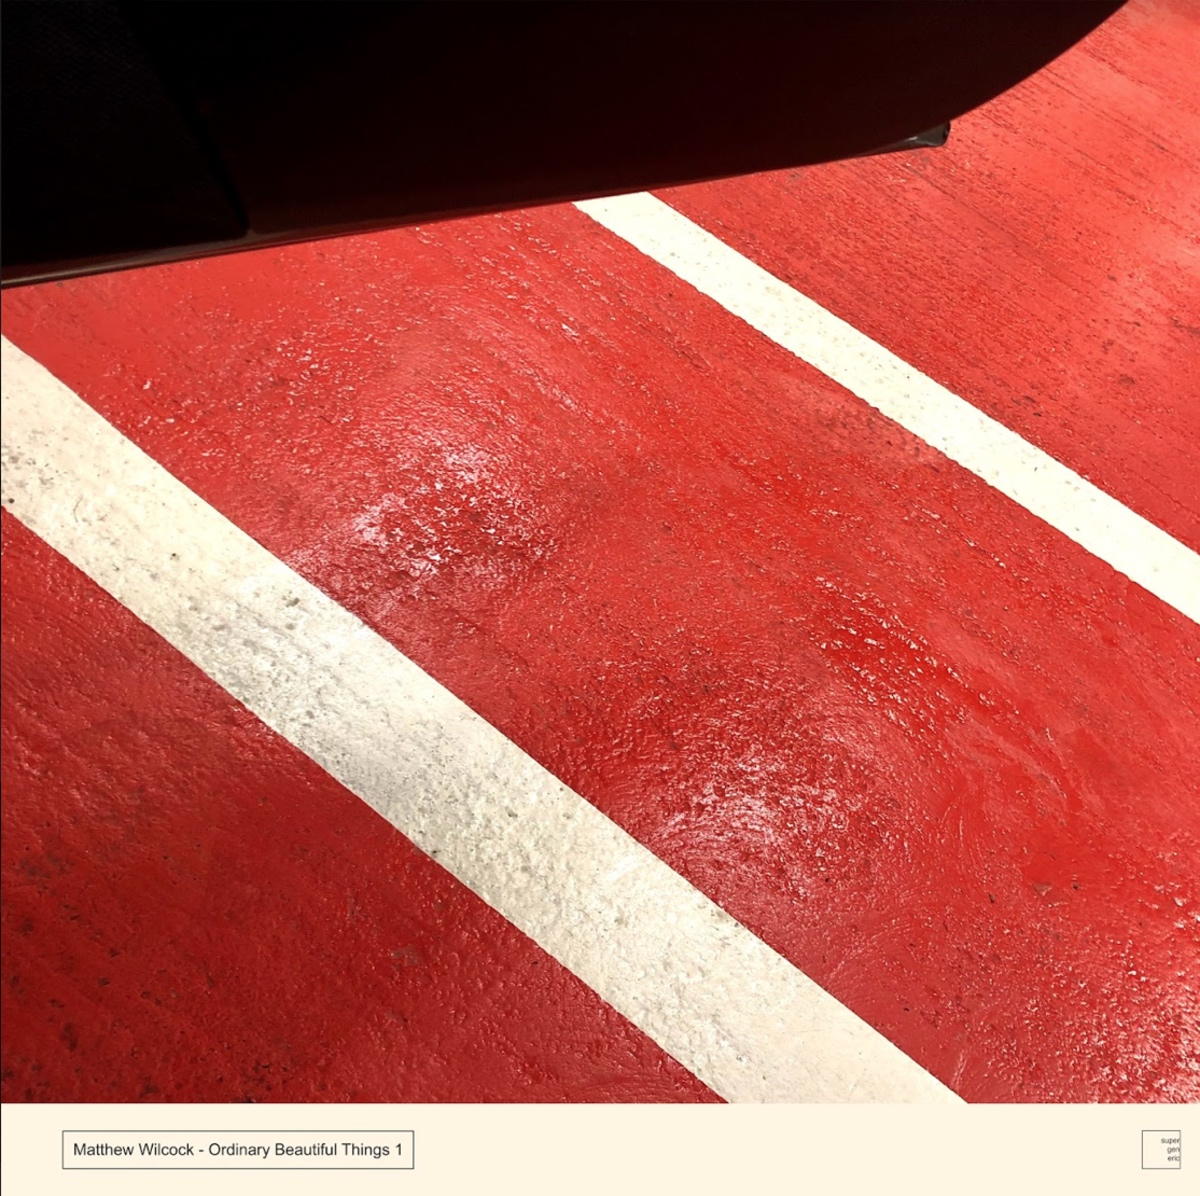 Matthew Wilcock | Ordinary Beautiful Things